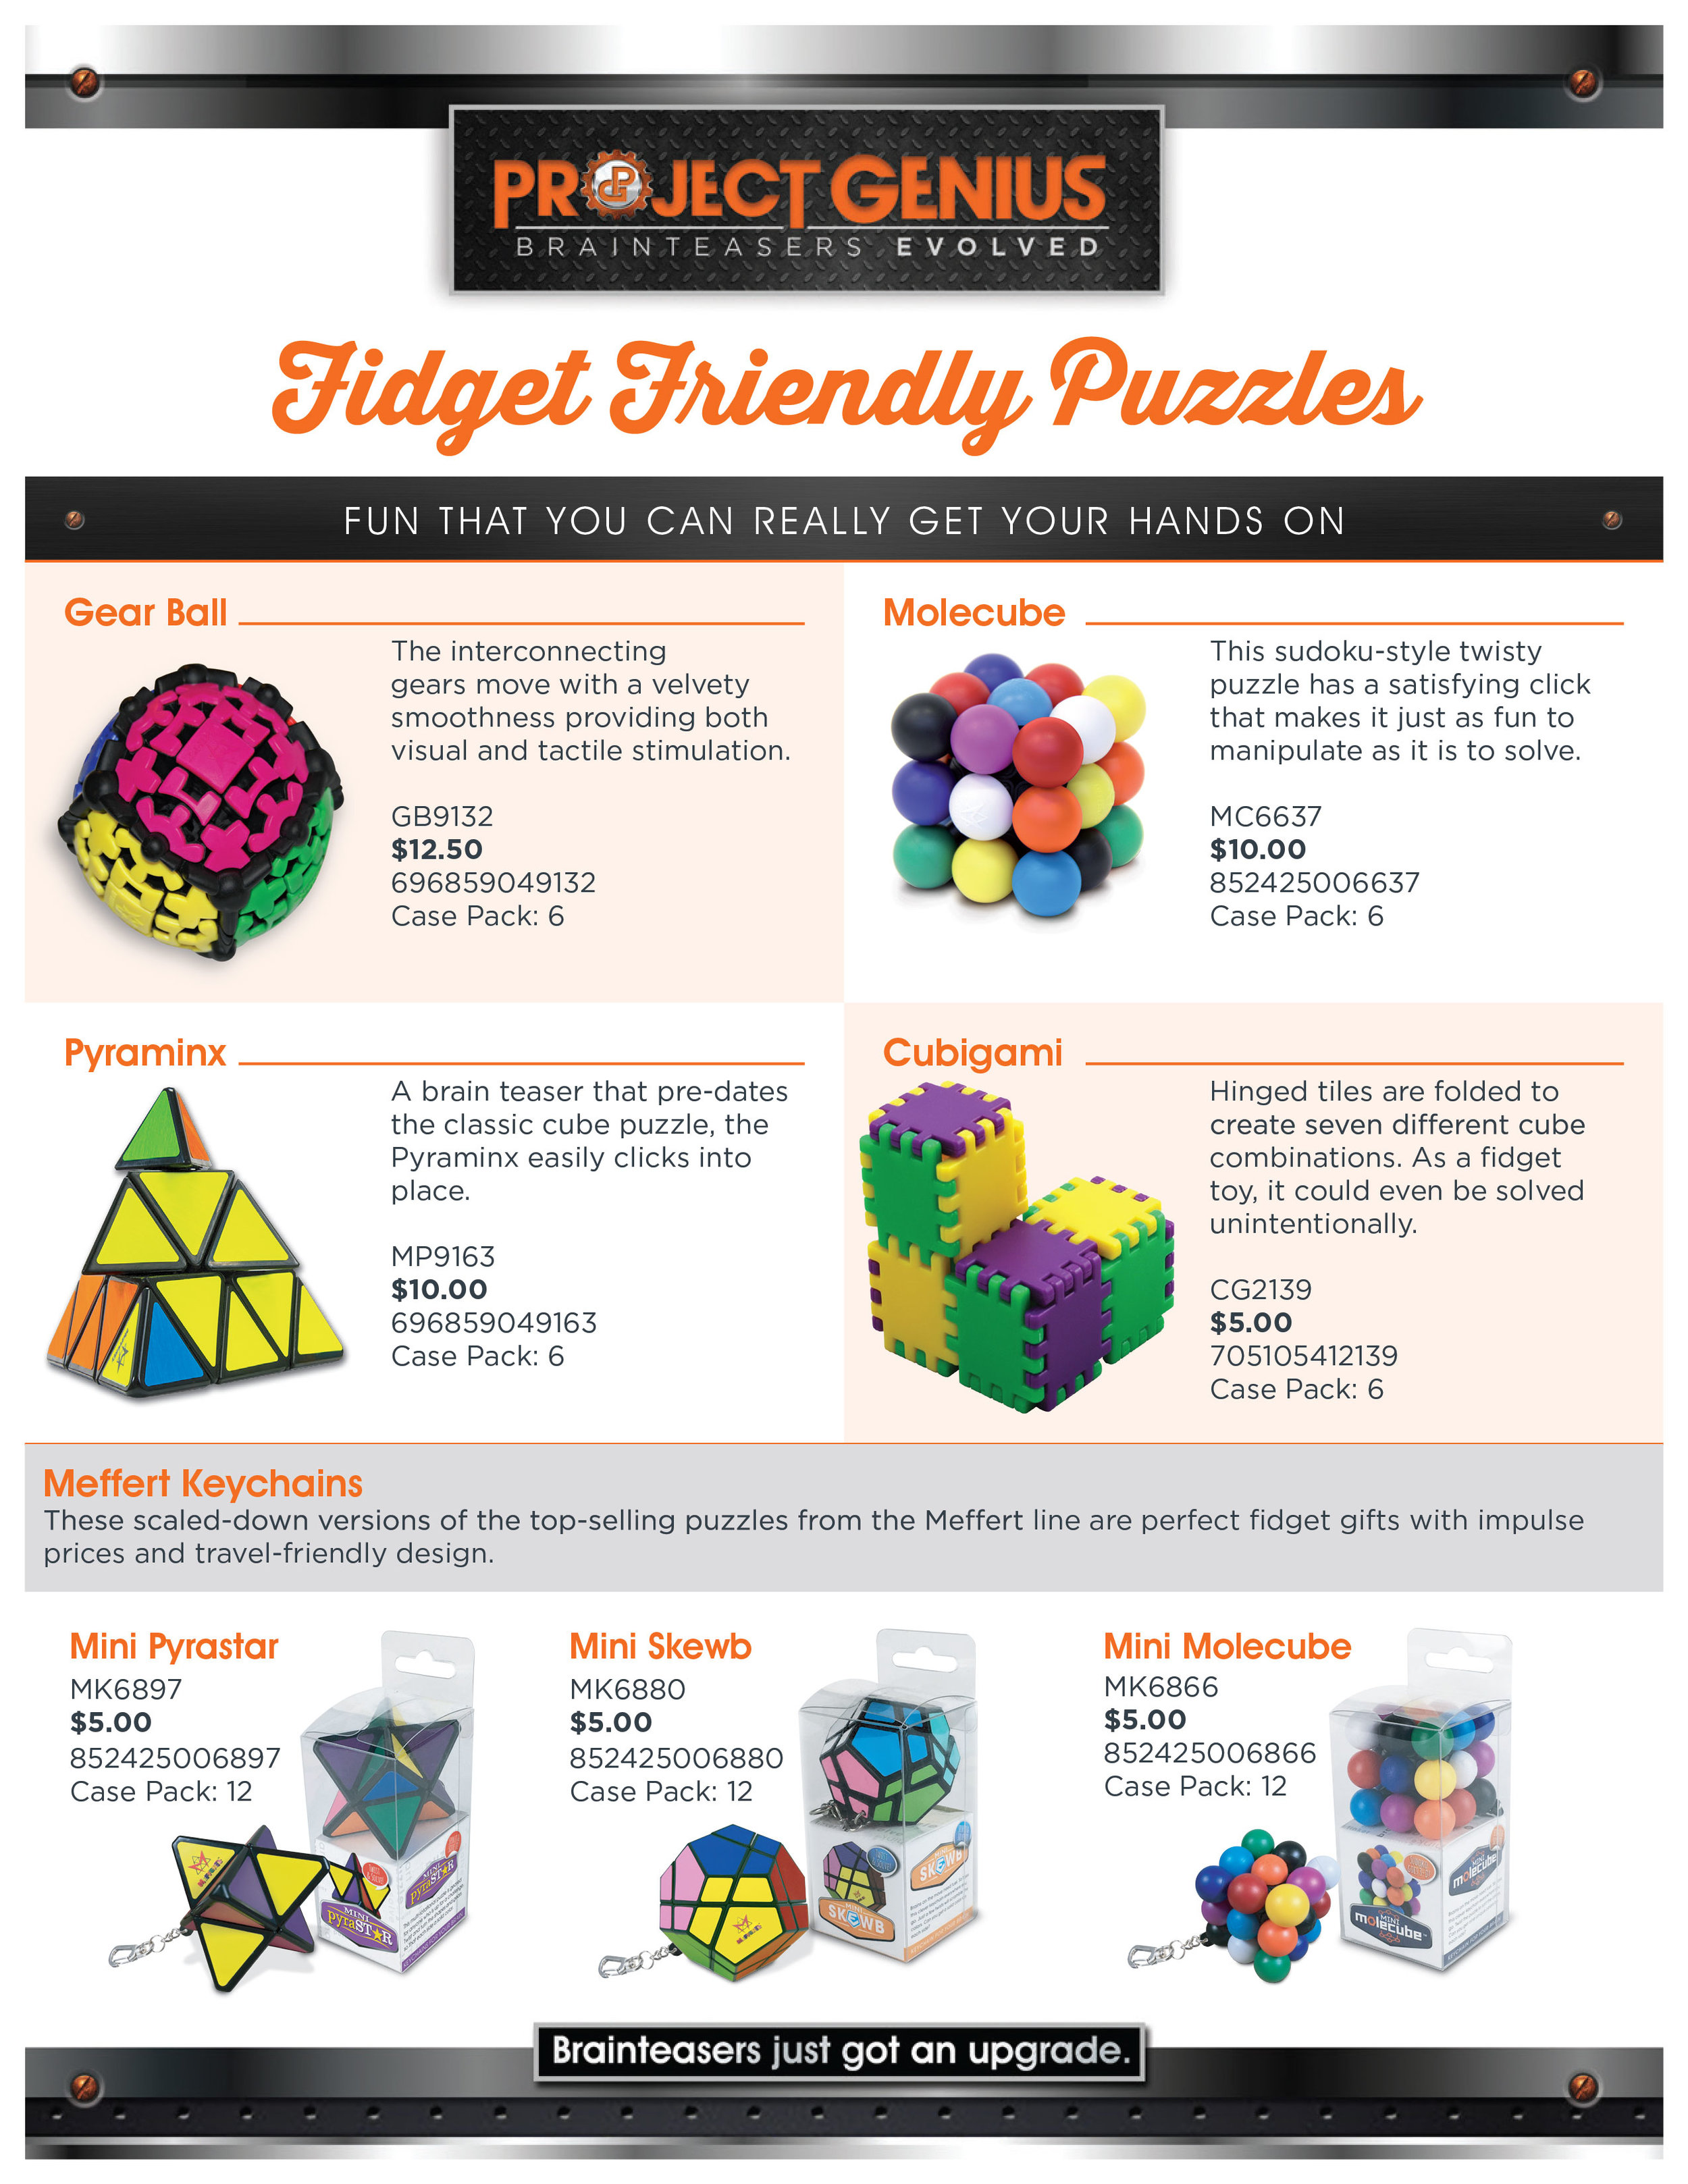 Fidget-Friendly_Puzzles-01.jpg